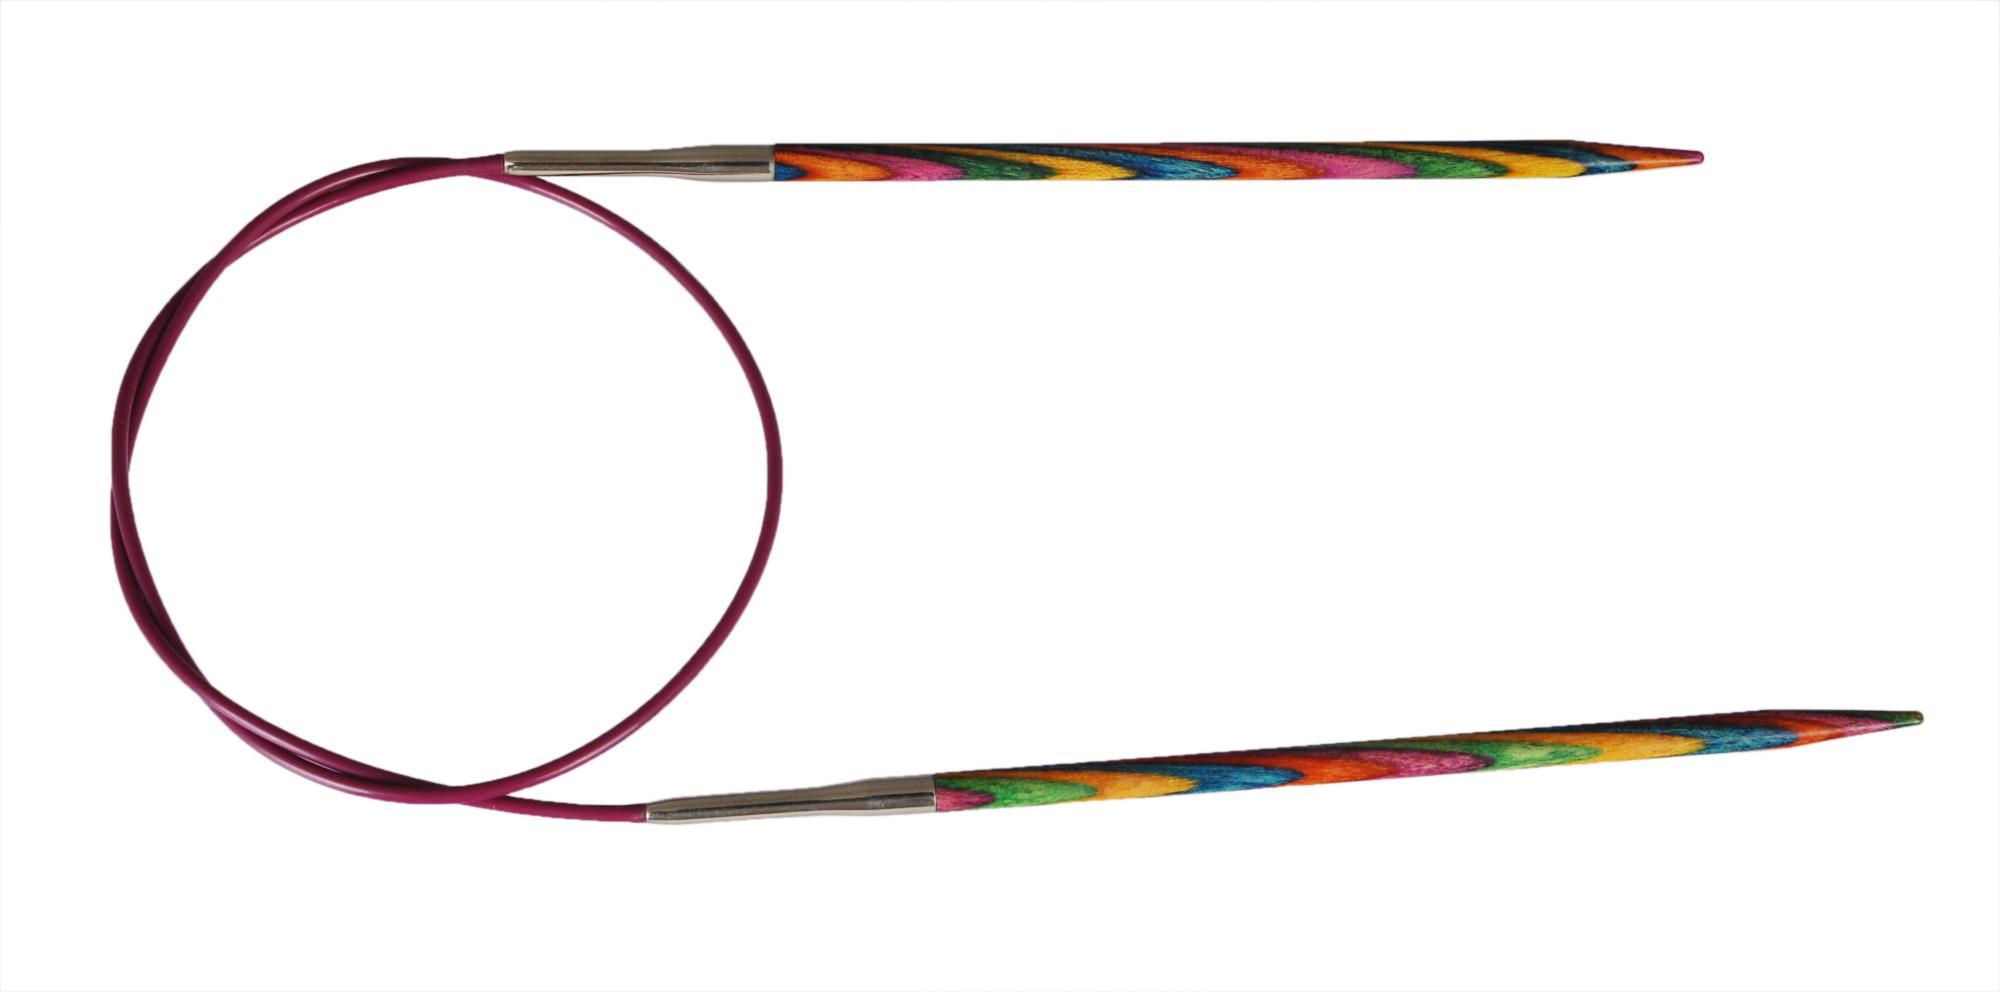 Спицы круговые 100 см Symfonie Wood KnitPro, 20363, 2.50 мм